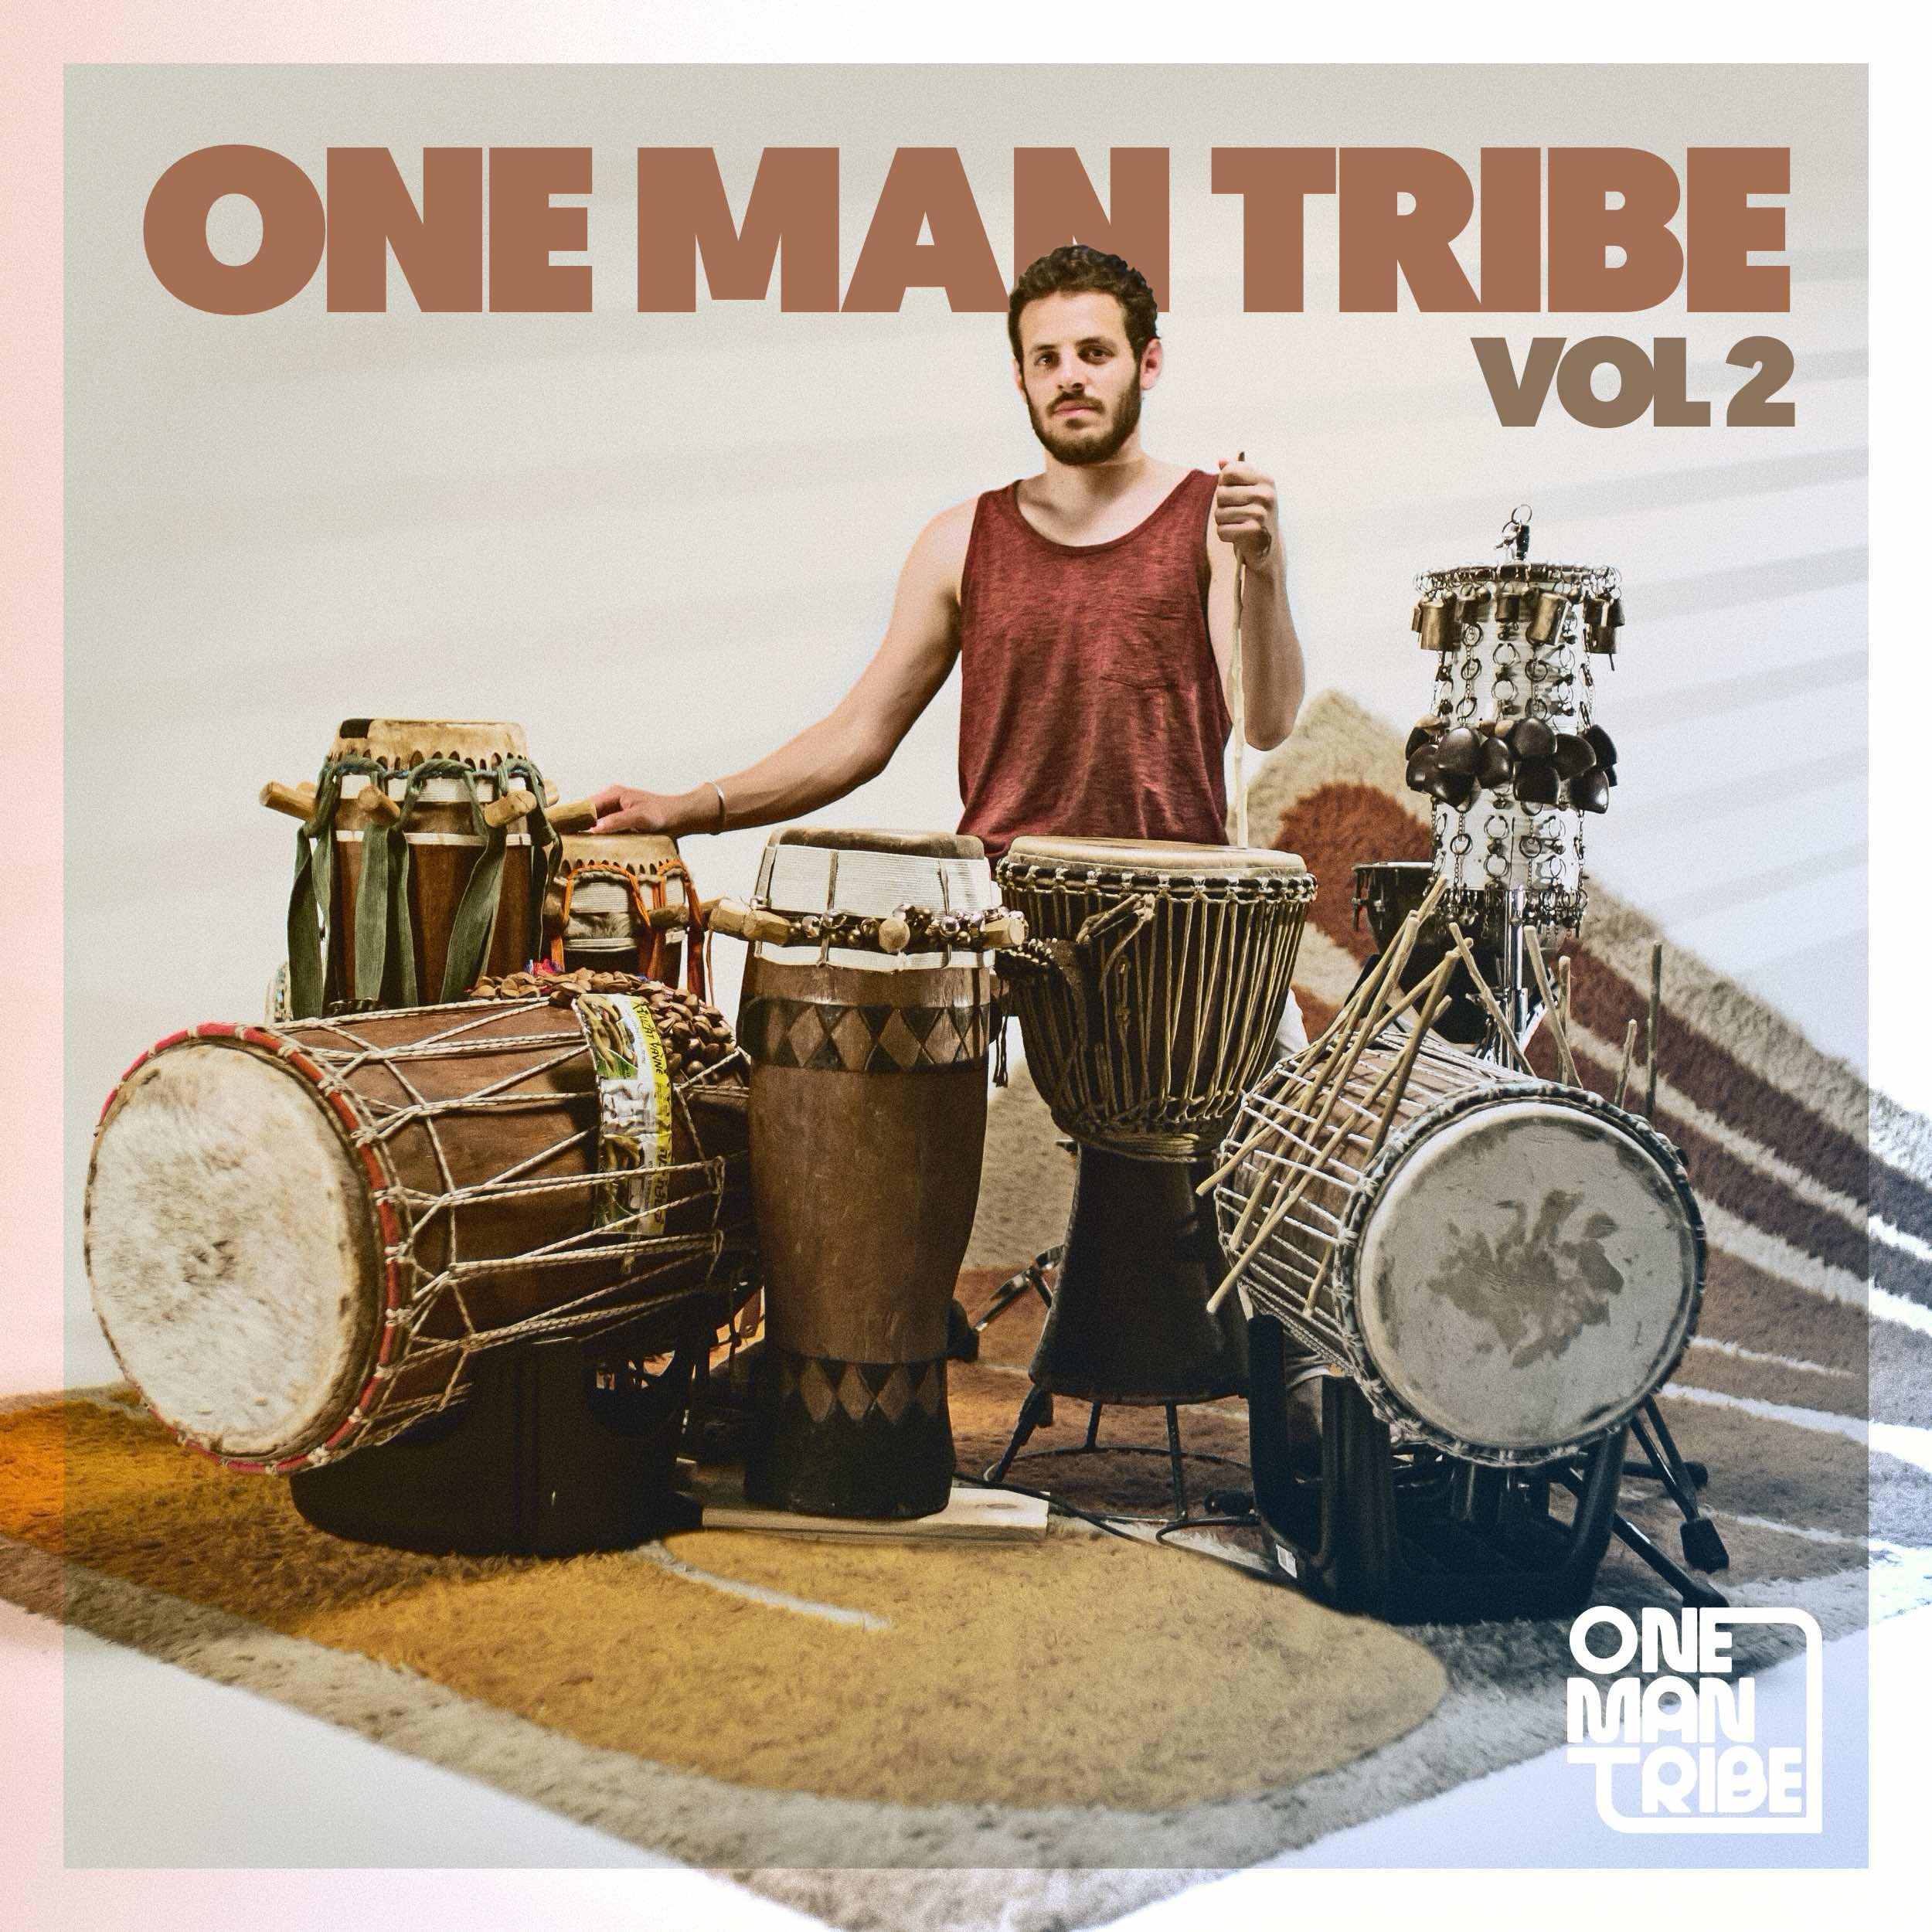 One Man Tribe Vol. 2